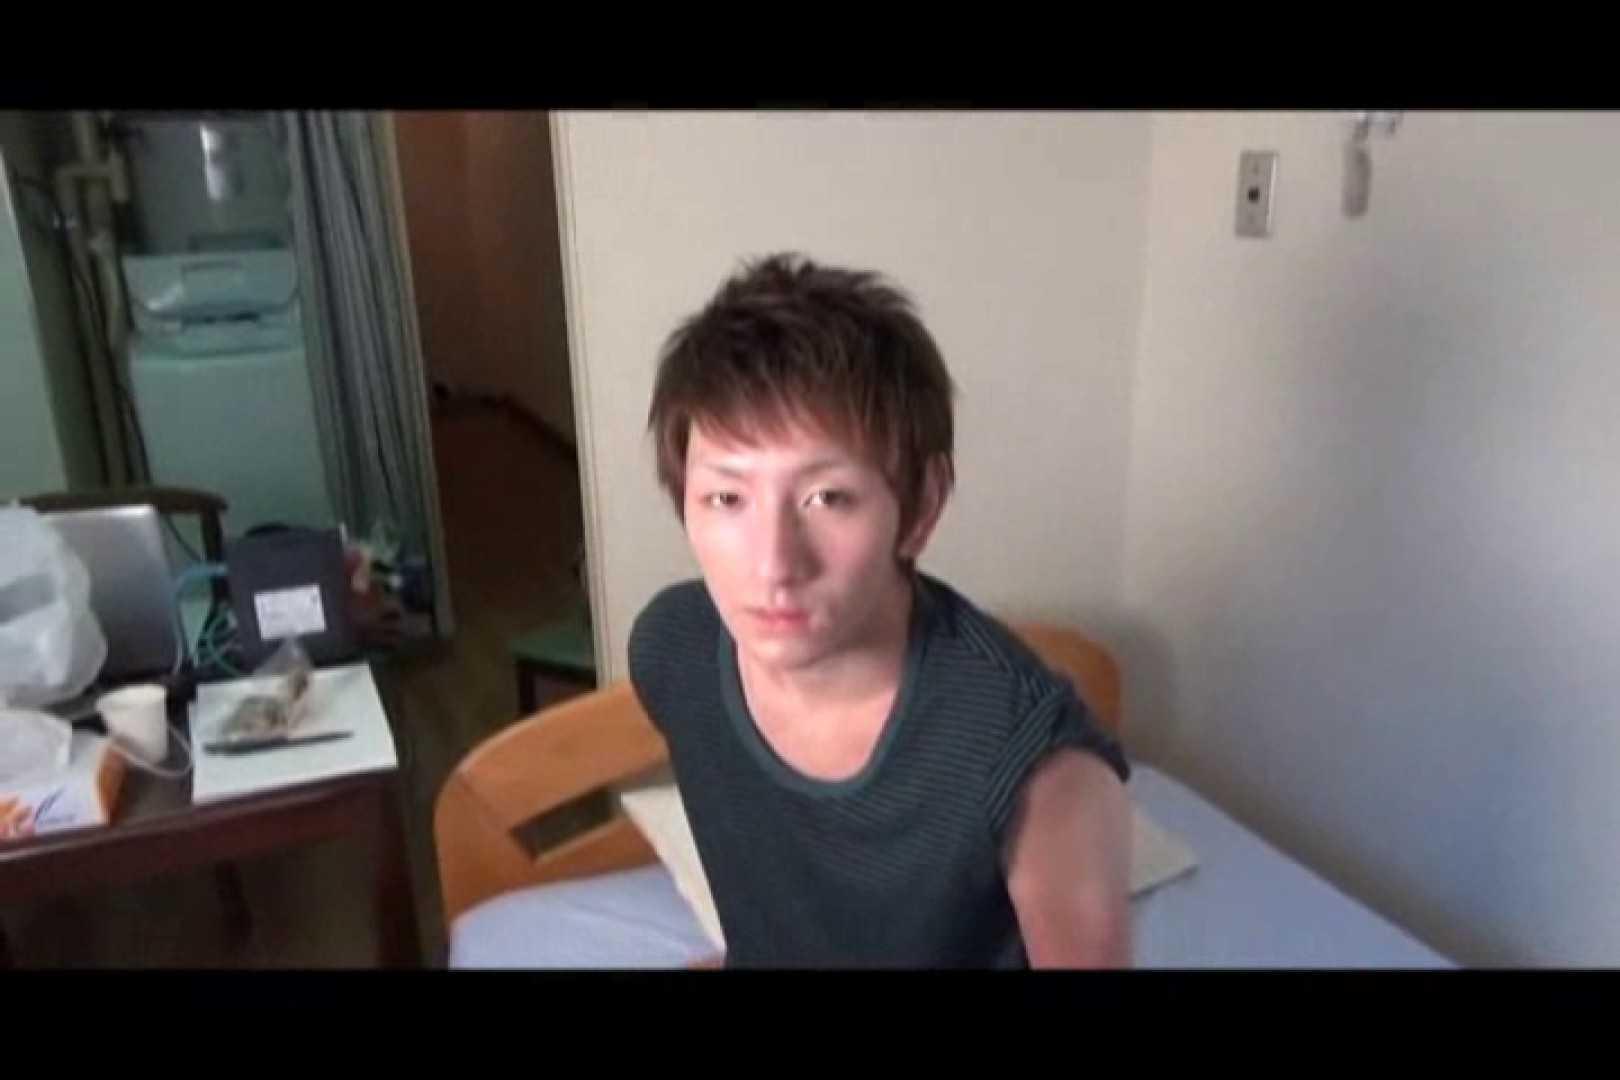 ONA見せカーニバル!! Vol2 イケメン・パラダイス ゲイ精子画像 98画像 32